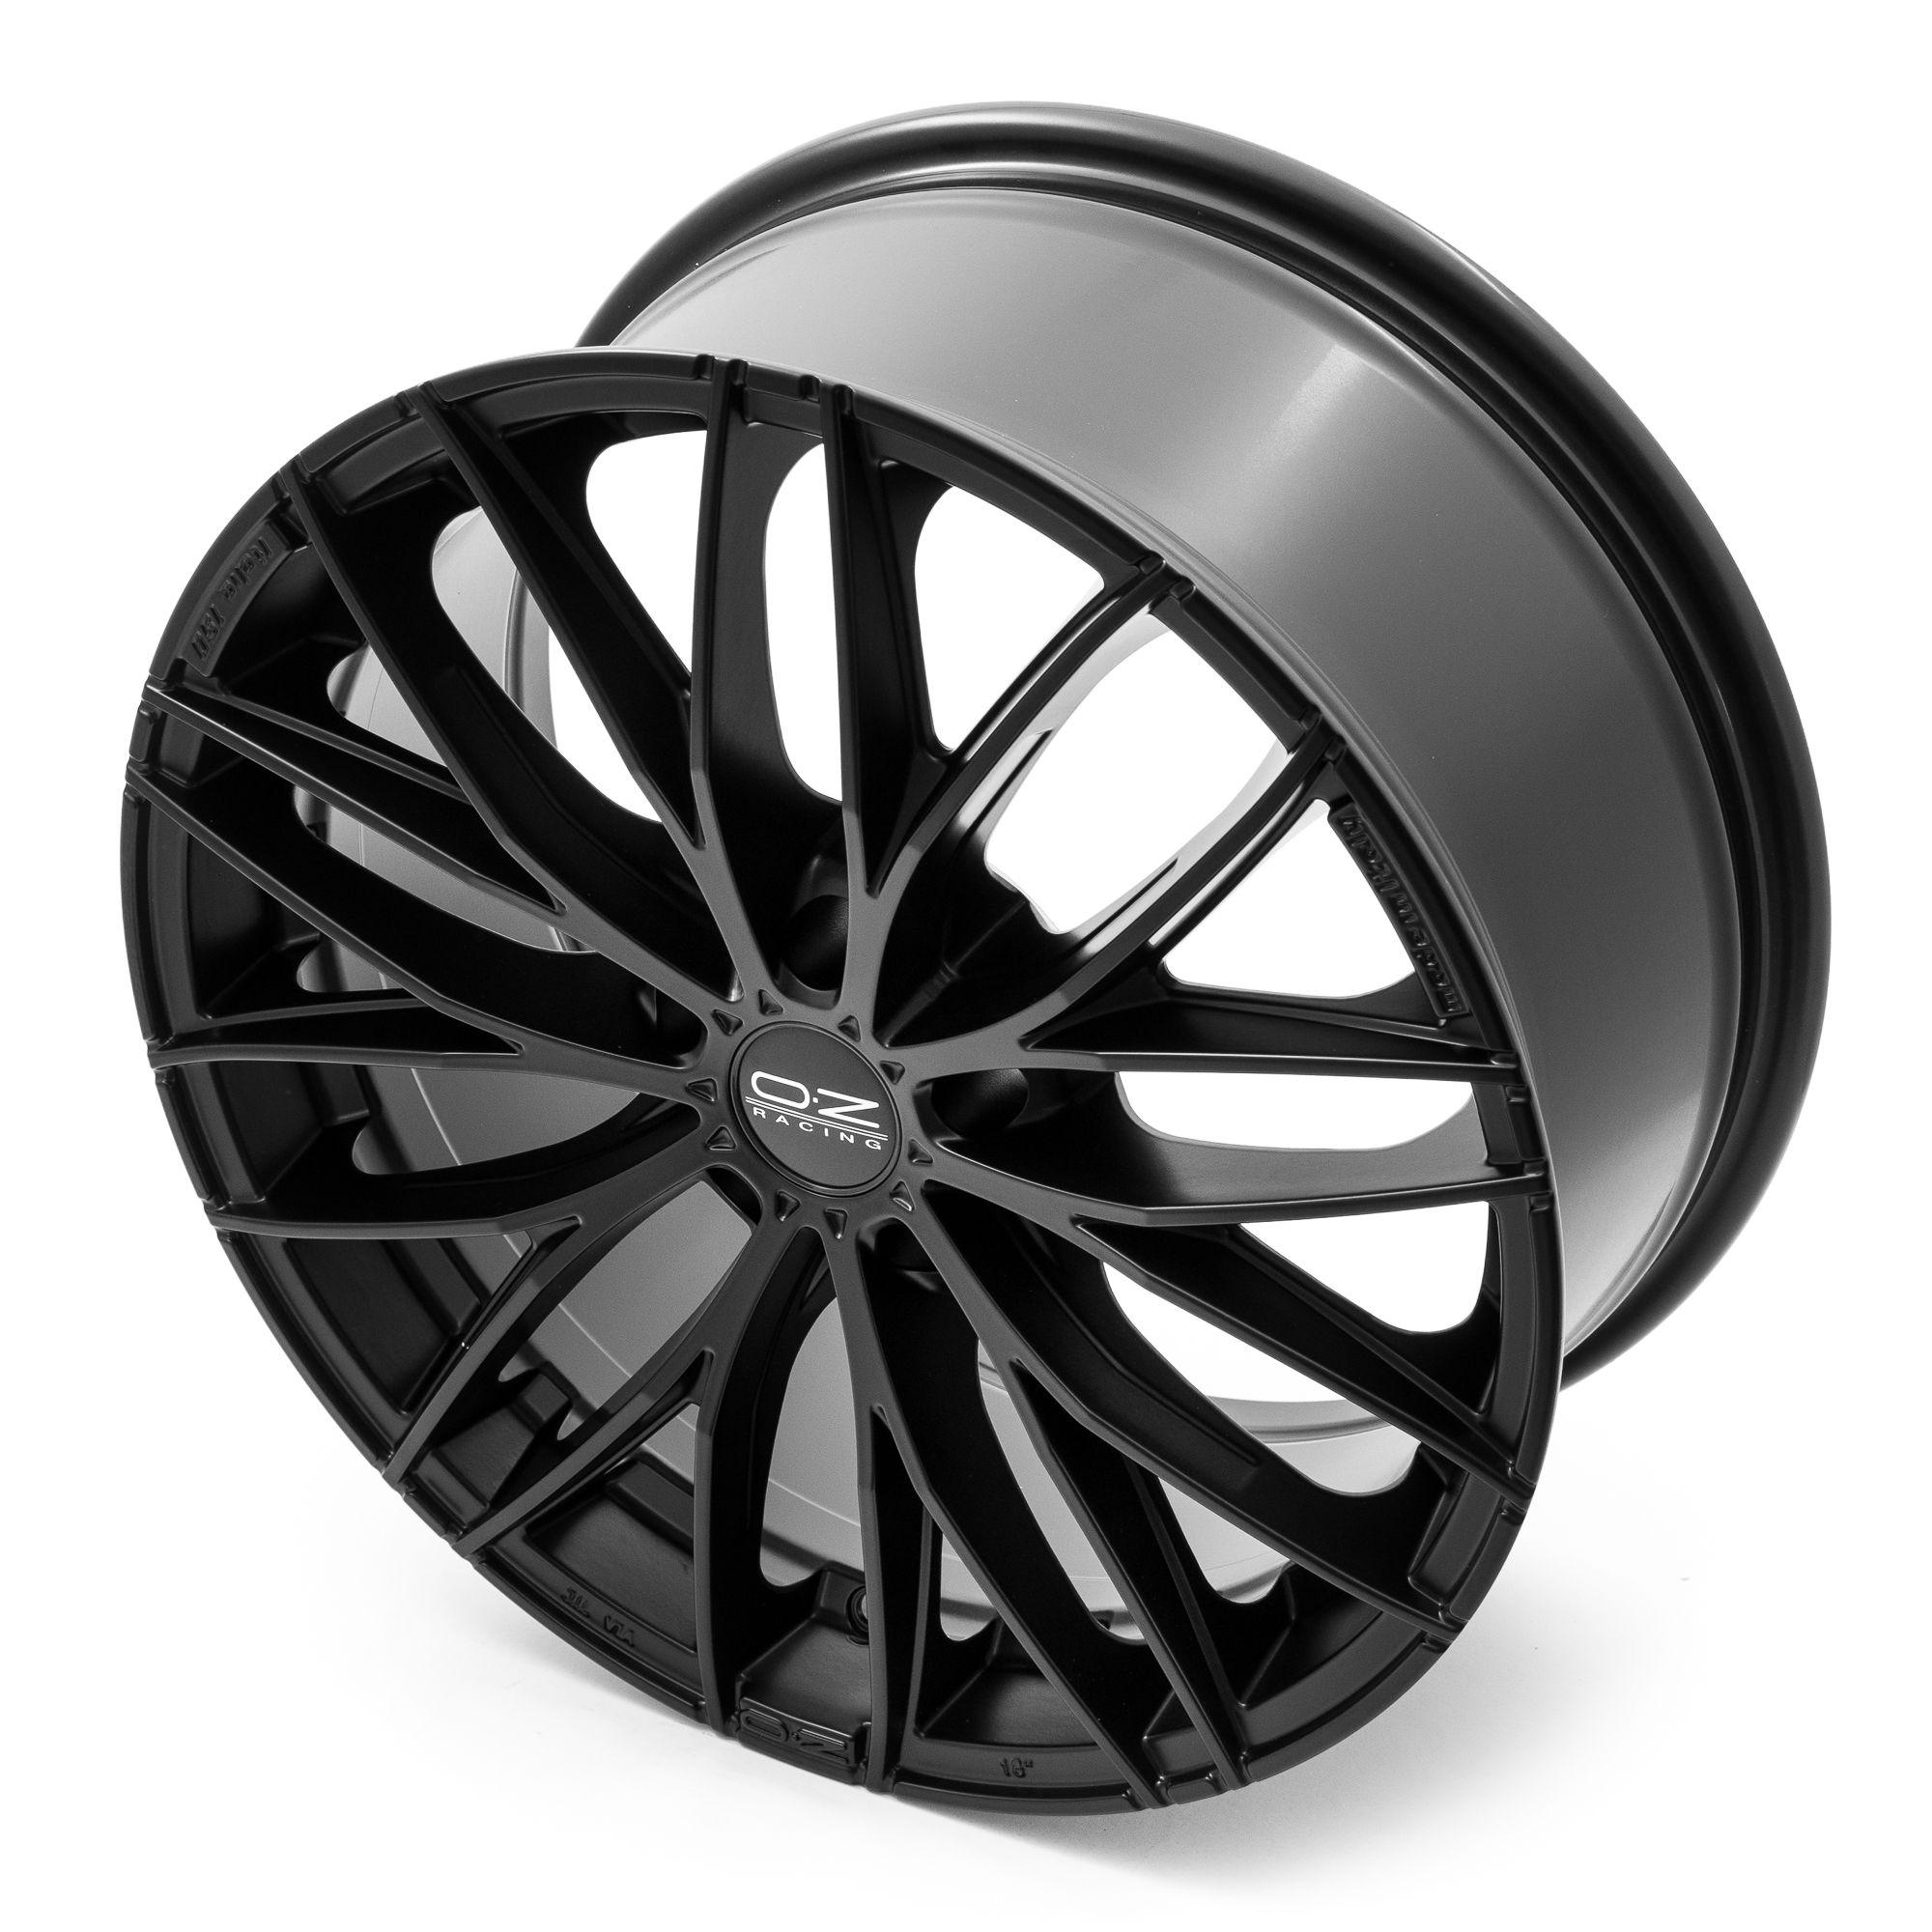 oz racing italia 150 felgen matt black in 18 zoll. Black Bedroom Furniture Sets. Home Design Ideas